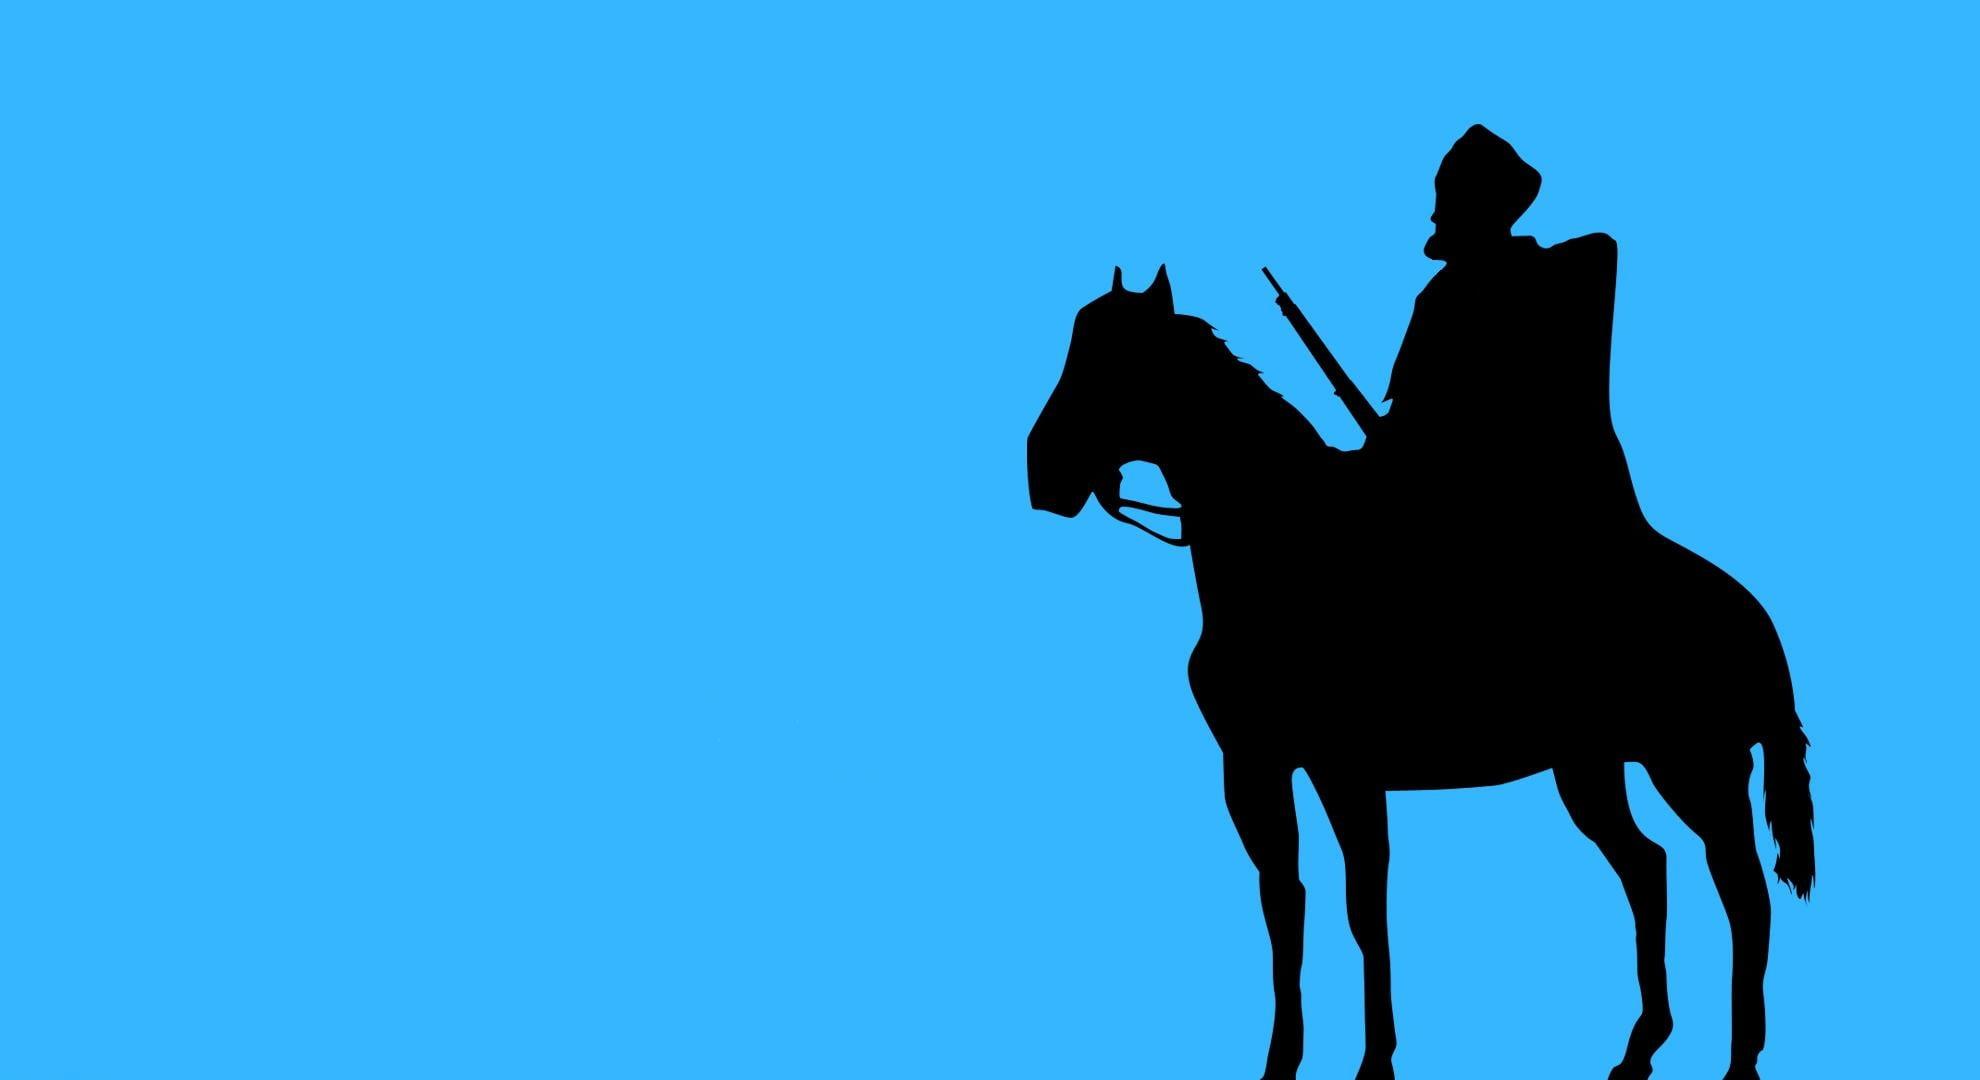 1980x1080 Person Riding Horse Silhouette Hd Wallpaper Wallpaper Flare